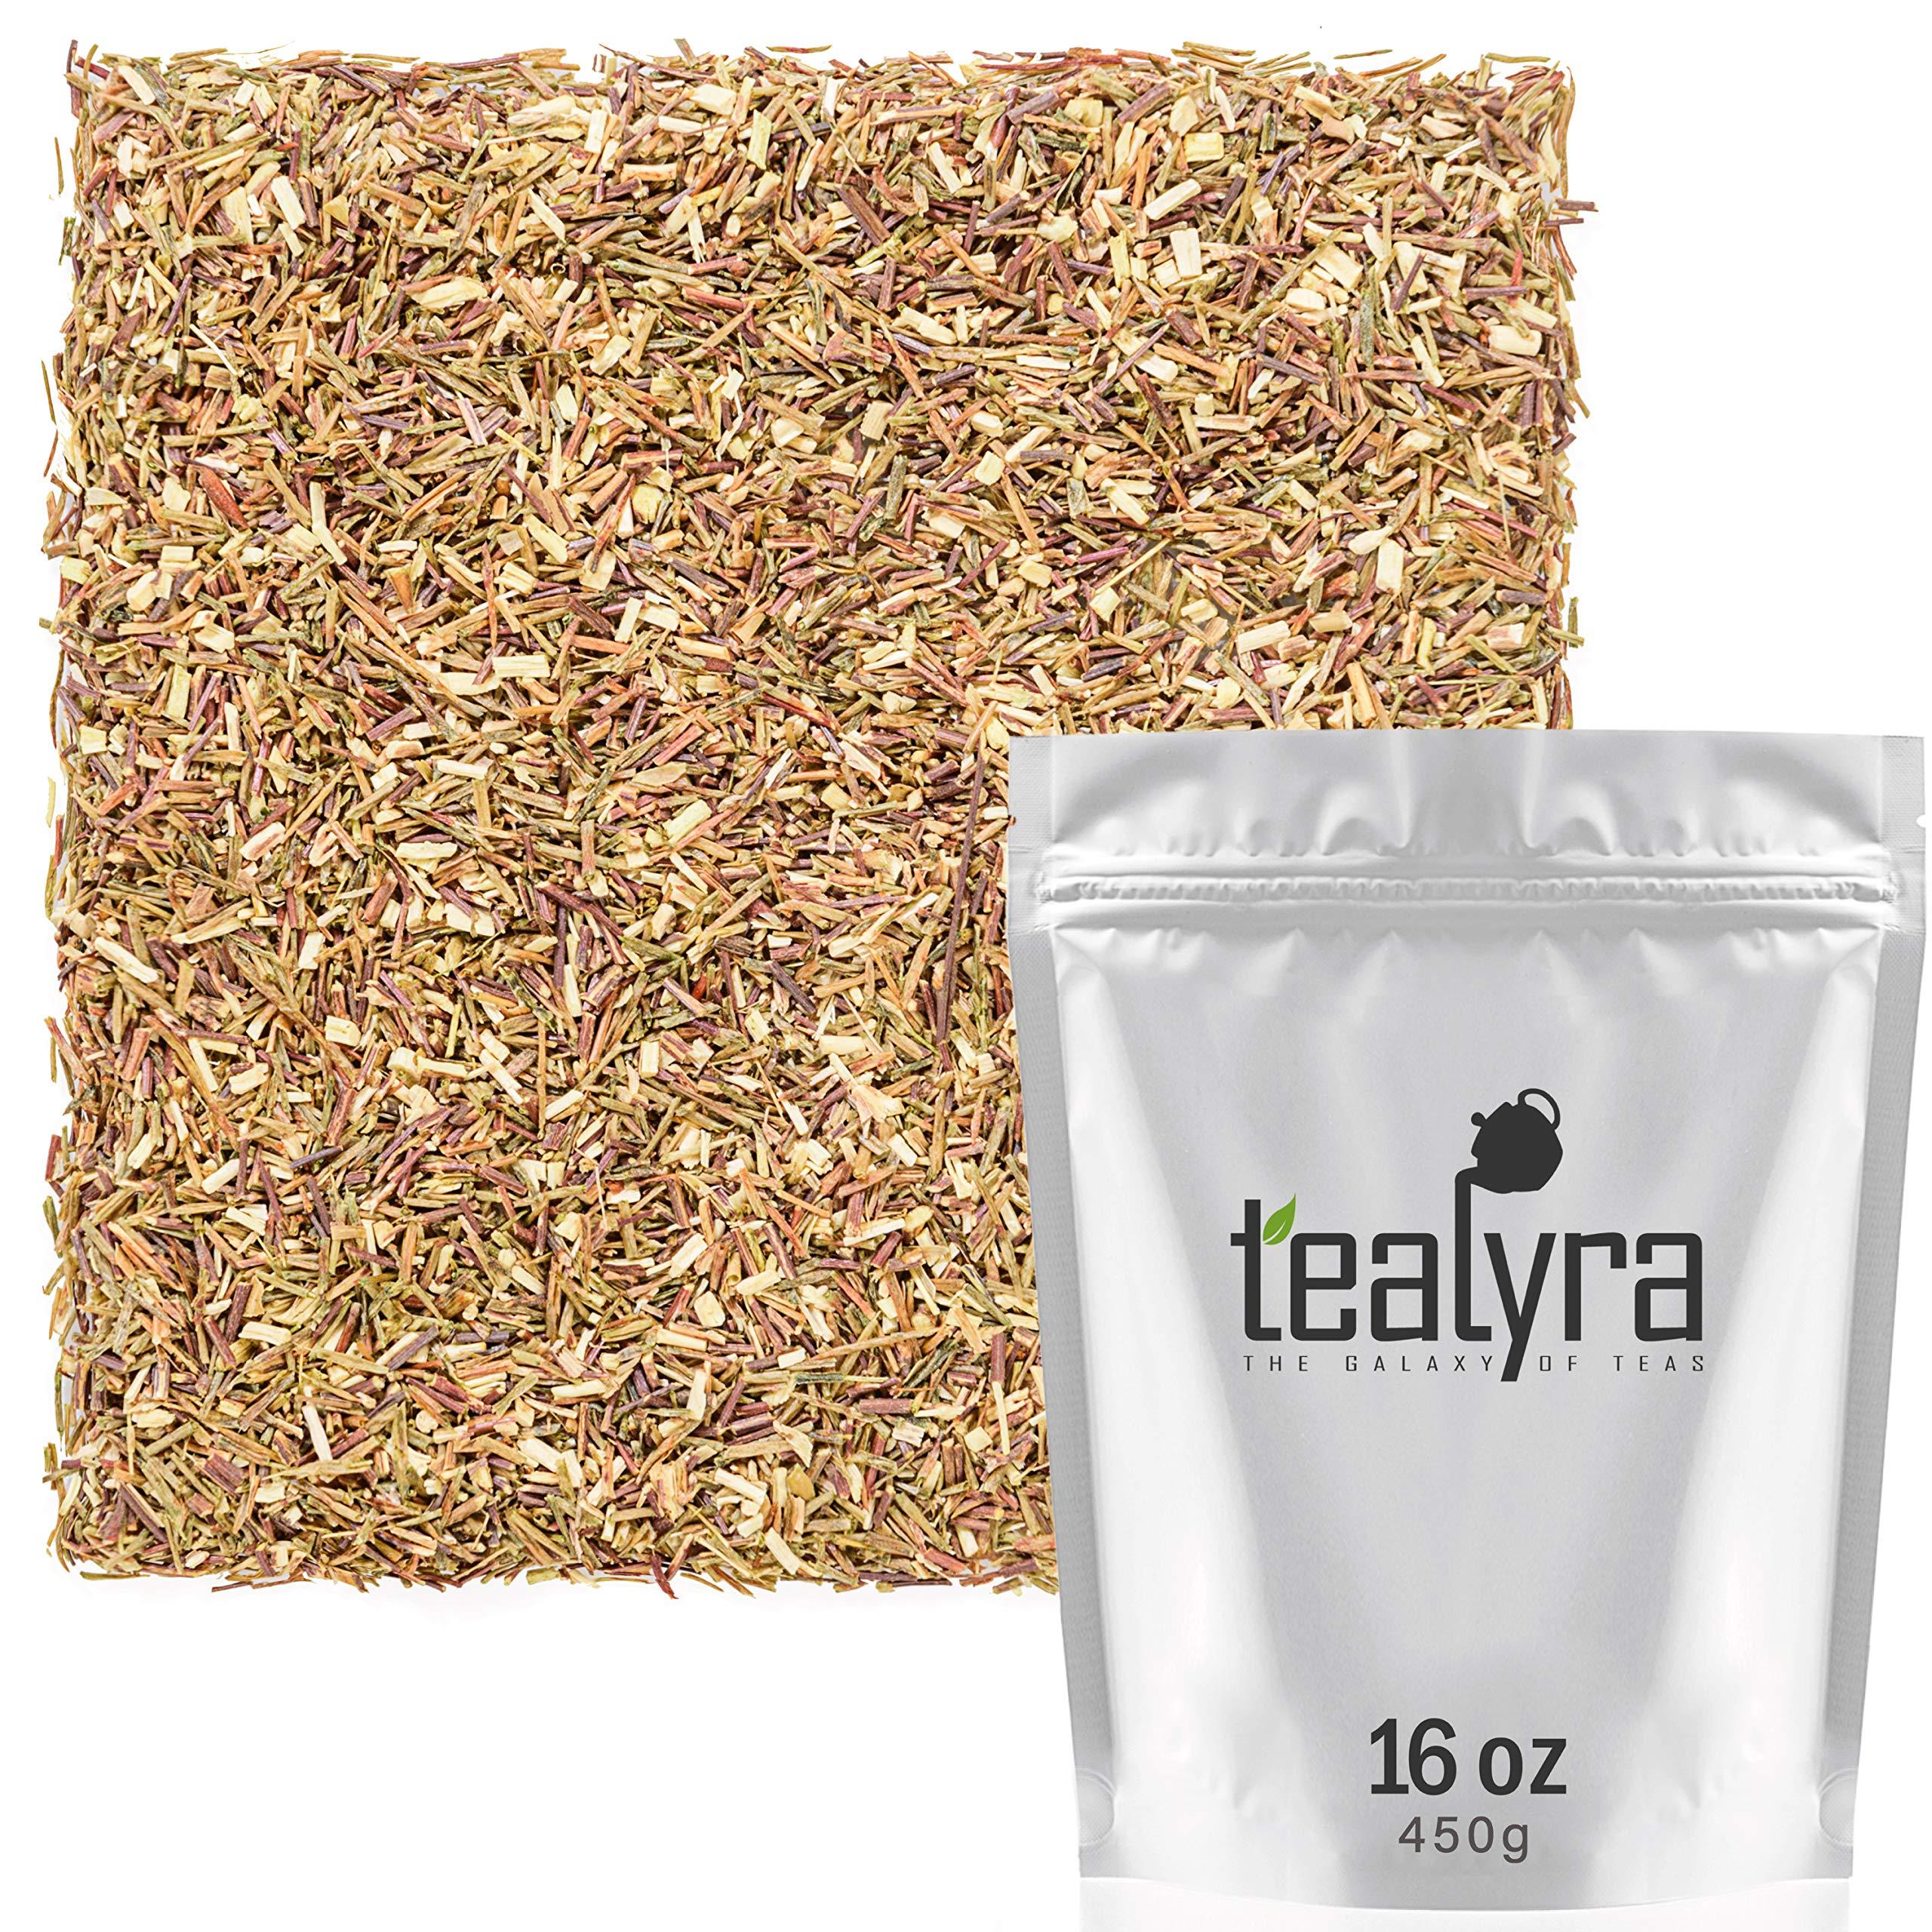 Tealyra - Green Rooibos - Pure Herbal Loose Leaf Tea - Antioxidants Rich - Relaxing Tea - Caffeine-Free - Organically Grown - 450g (16-ounce)